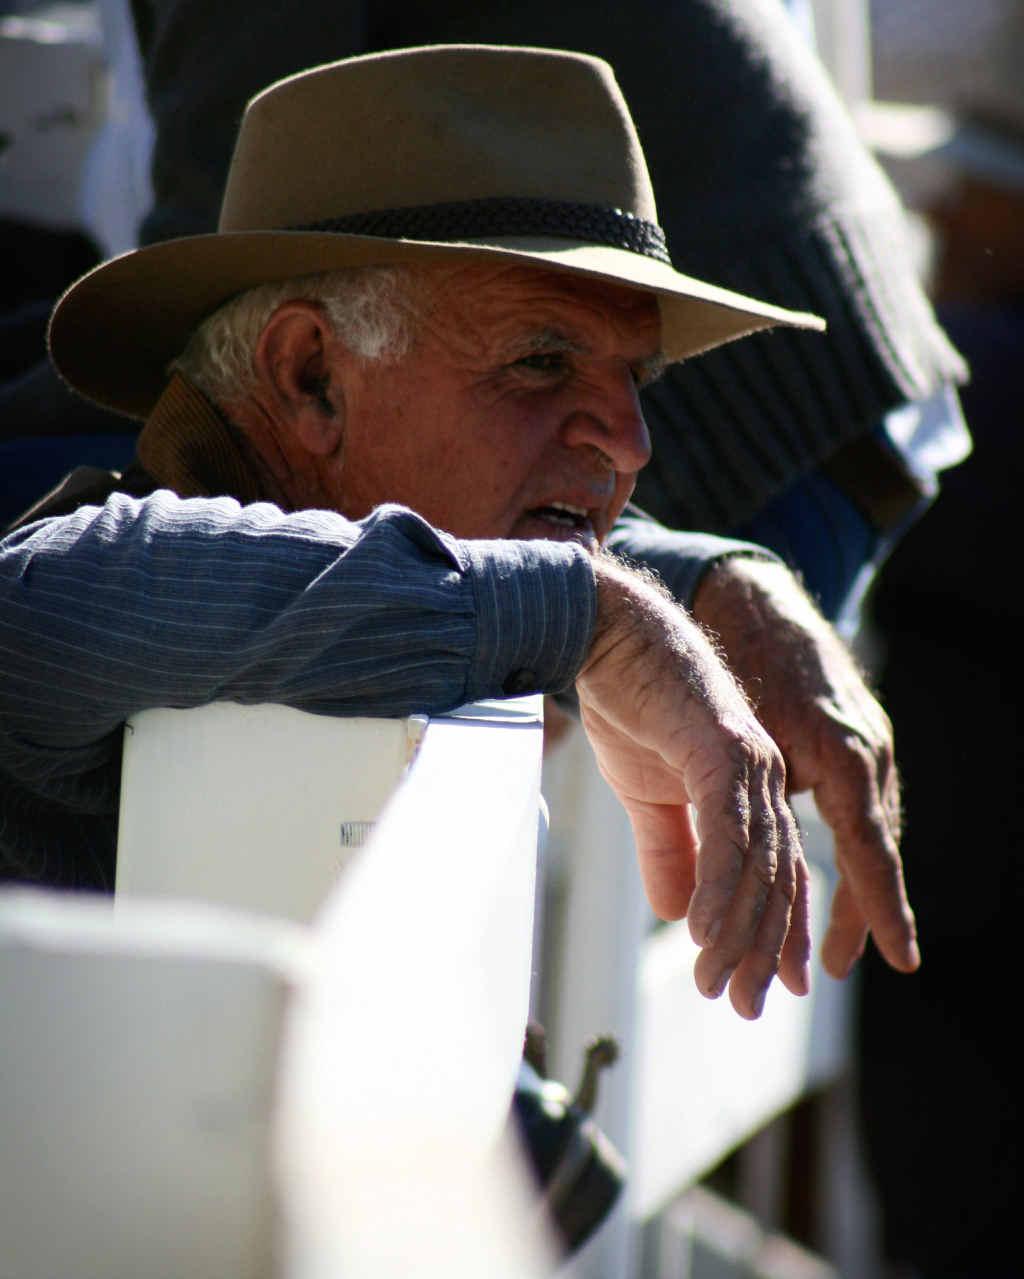 LEGEND: Happy Davis of Brushgrove, taken at the Big River Campdraft in Grafton.